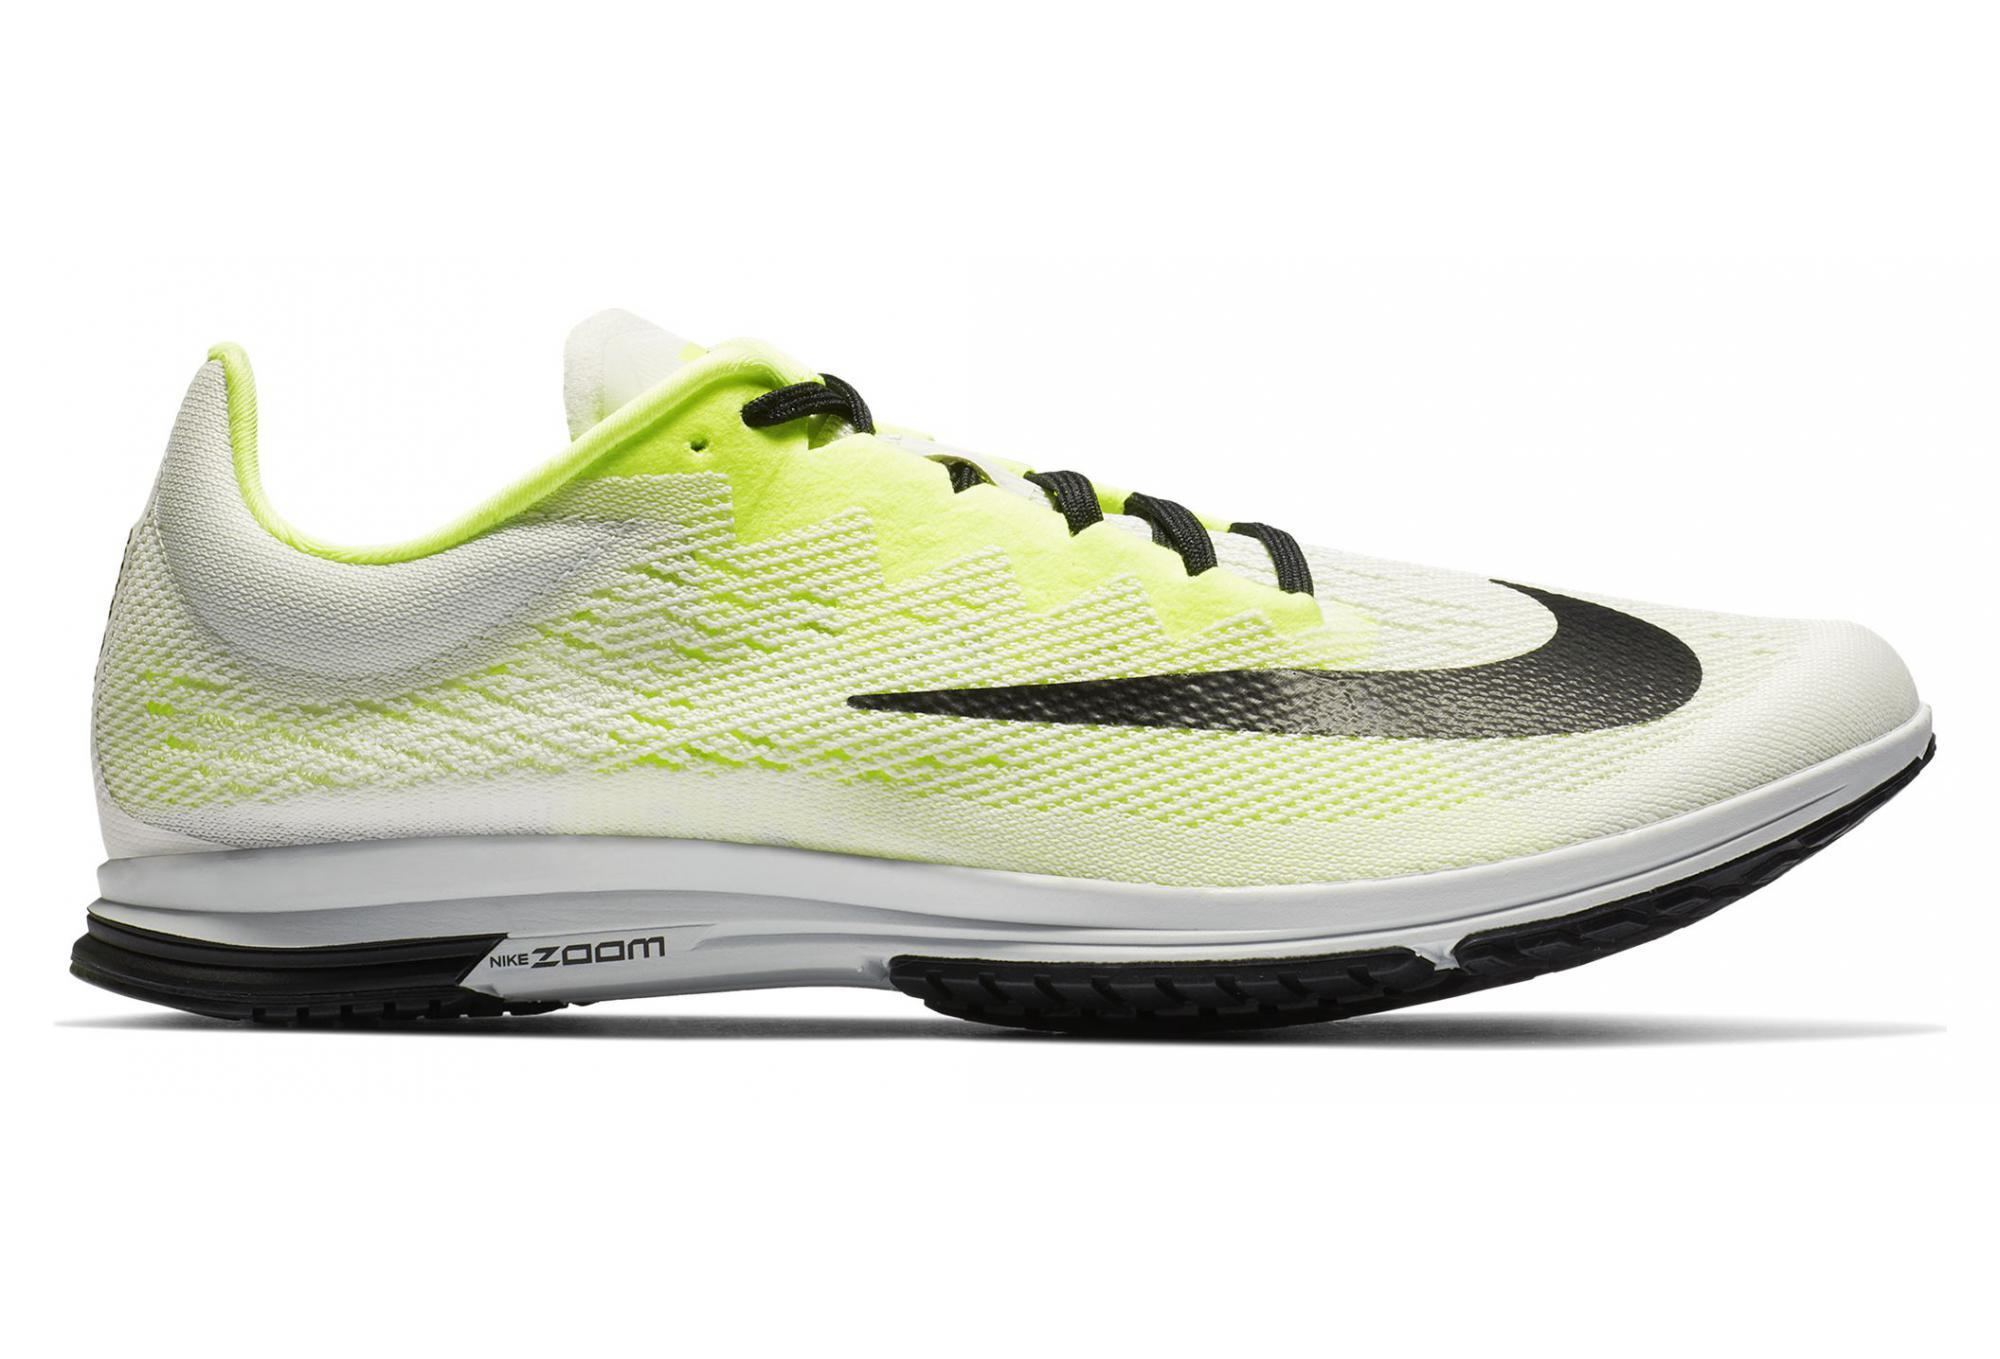 b9d5a89e273 Nike Zoom Streak LT 4 White Yellow Unisex